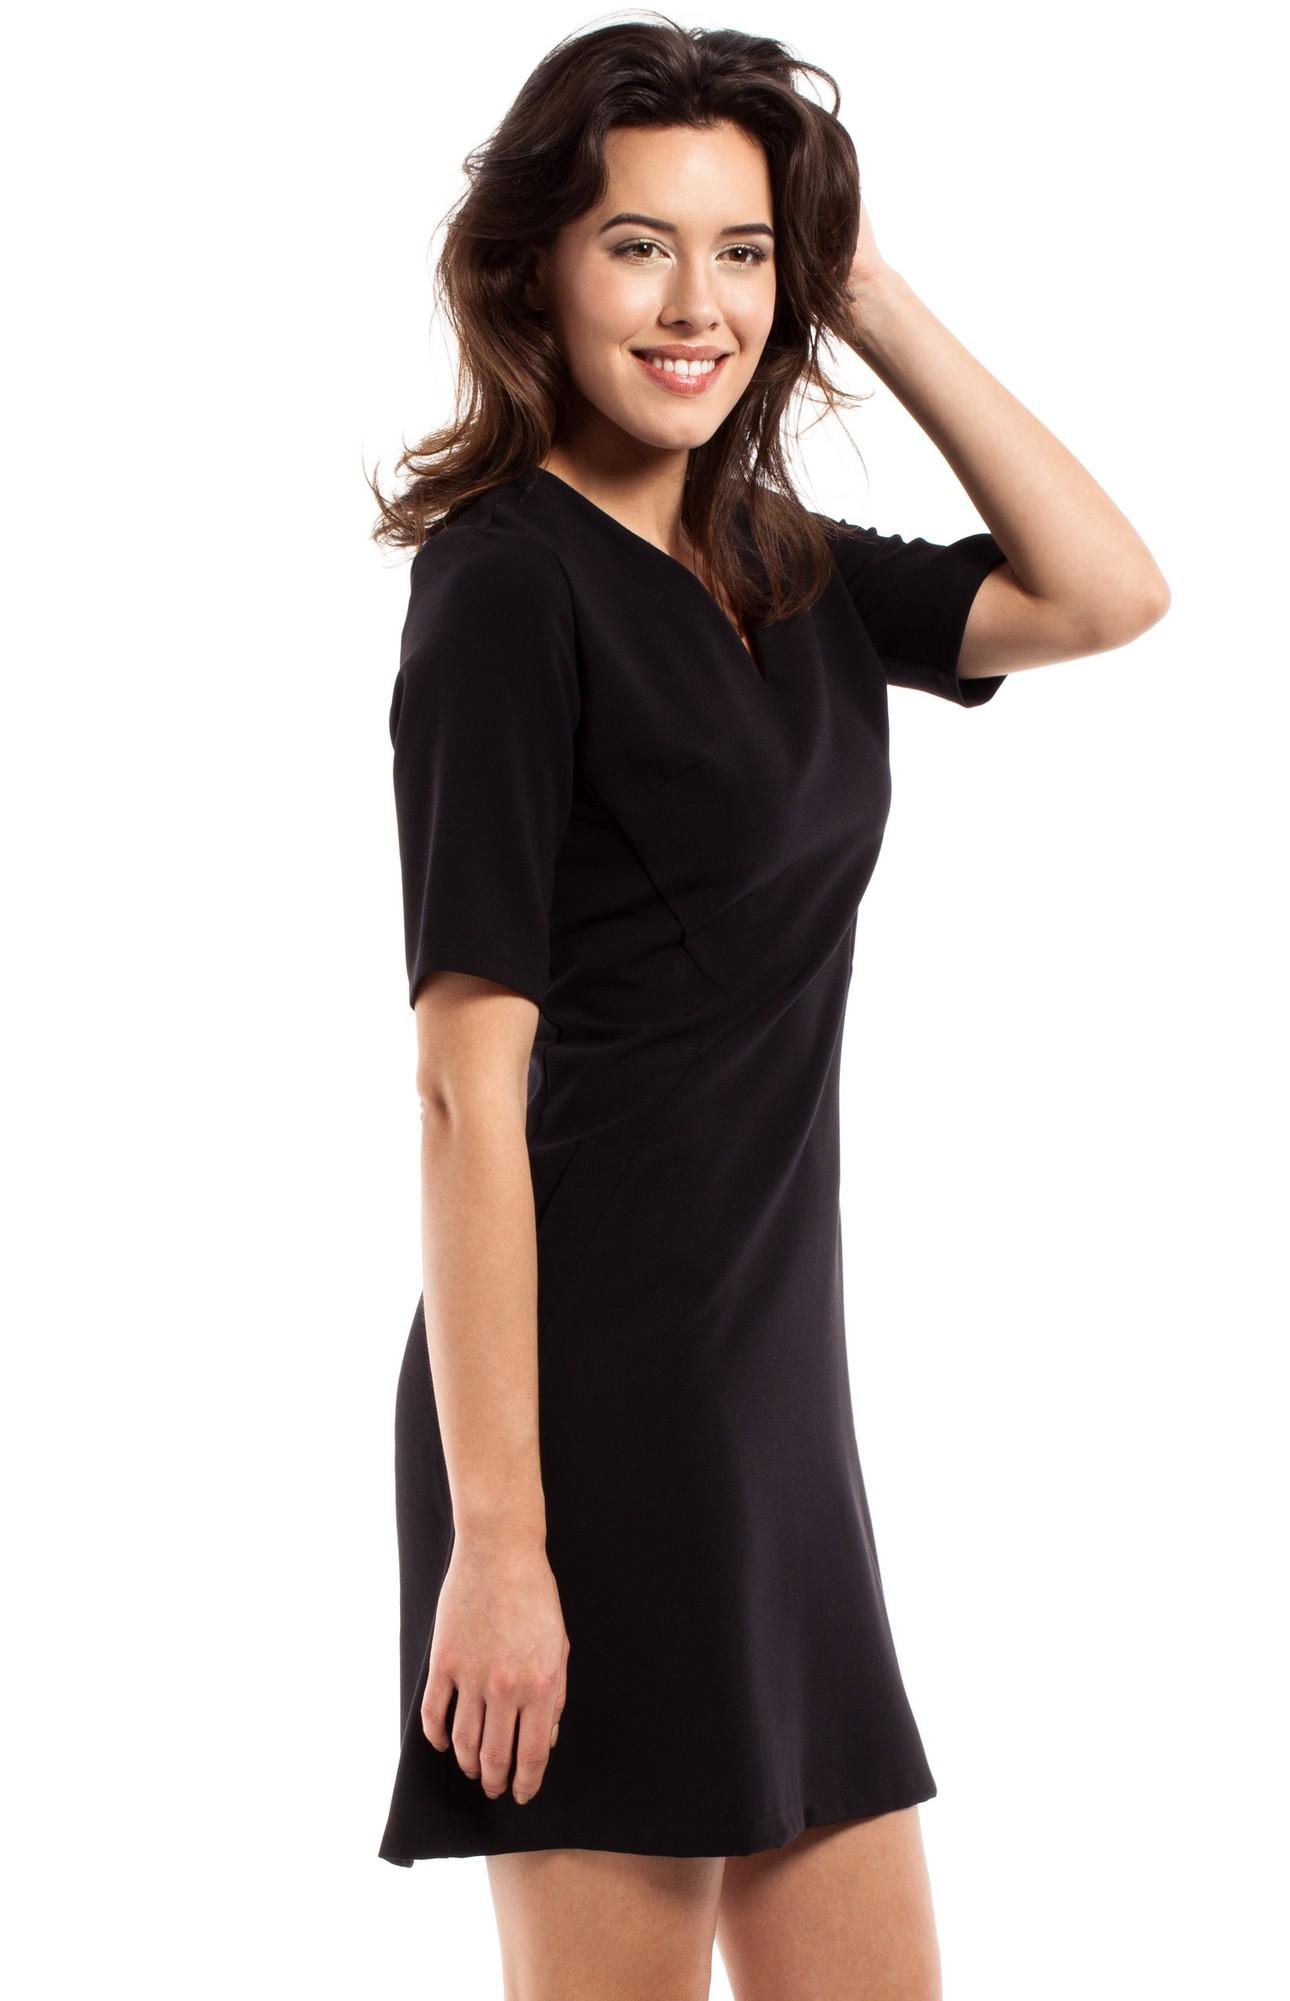 6b098710c1b Robe noire simple et chic robe chic cocktail